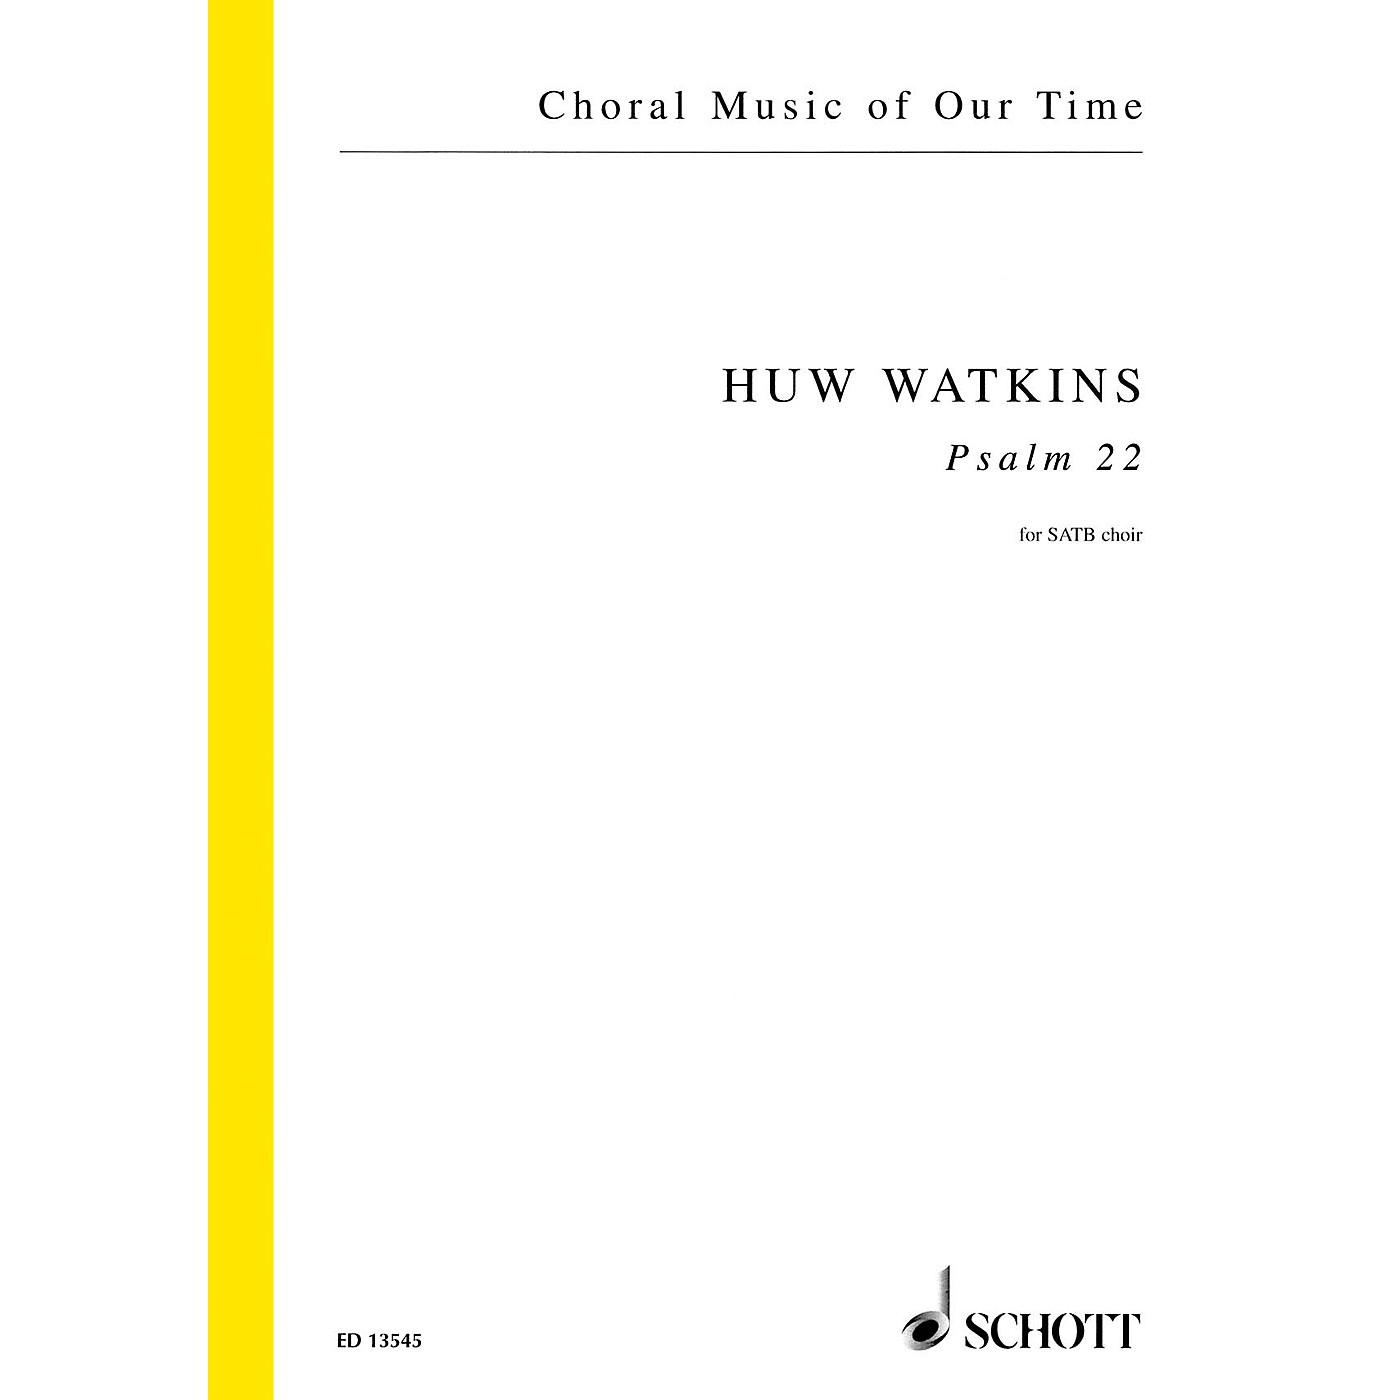 Schott Psalm 22 (SATB Choir unaccompanied) SATB a cappella Composed by Huw Watkins thumbnail